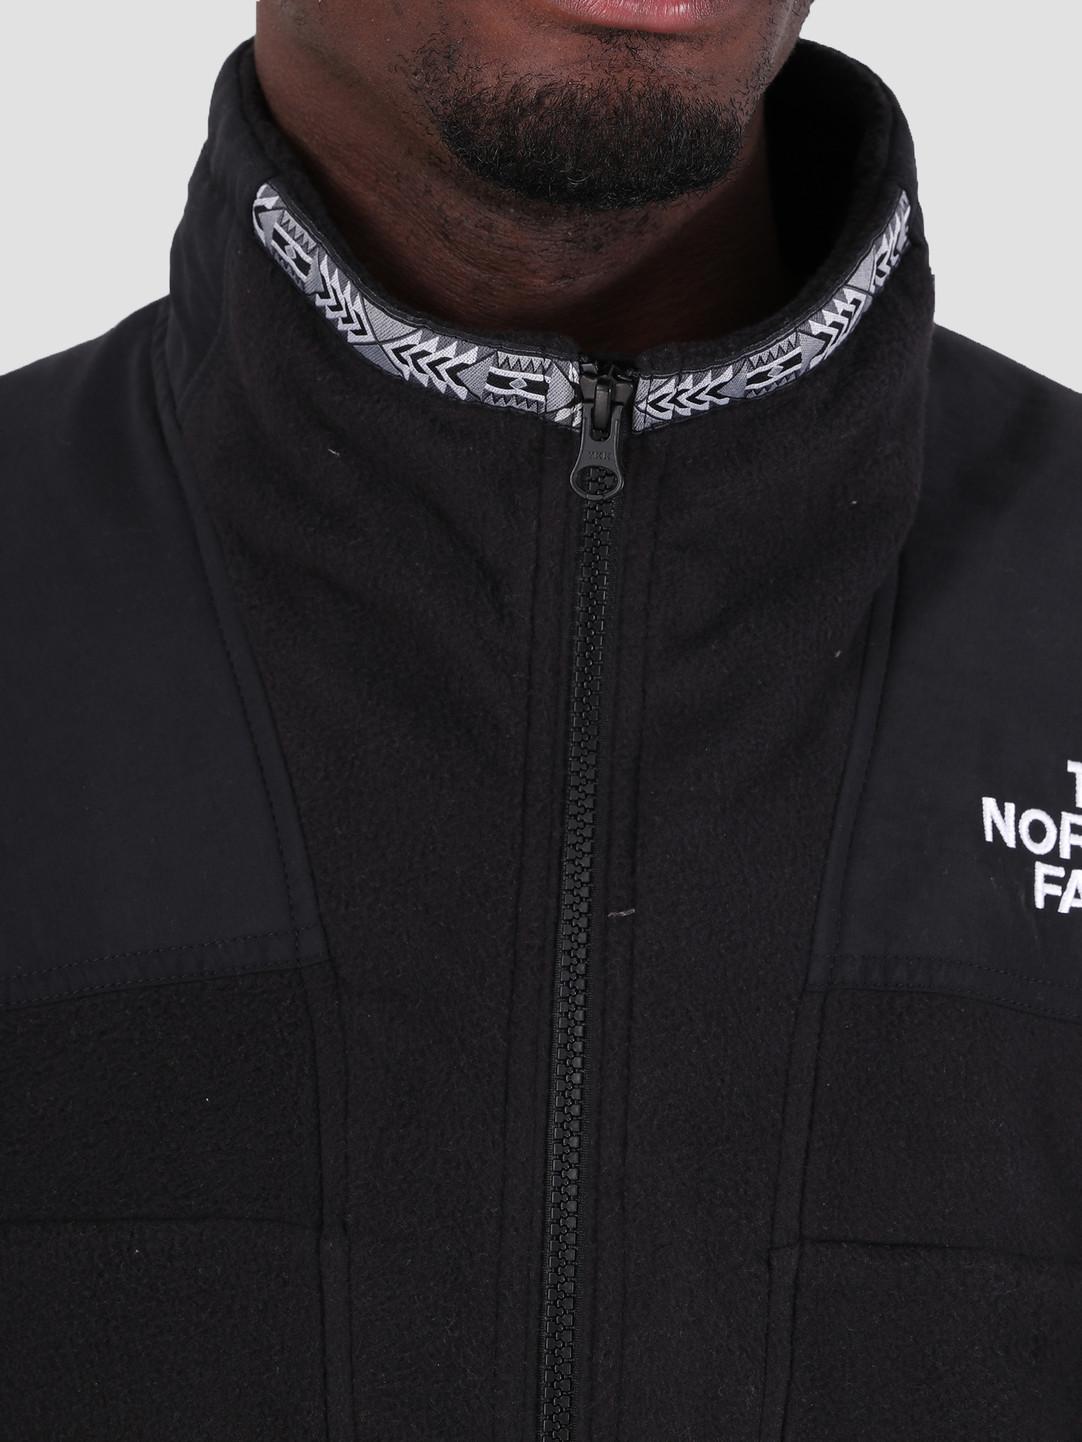 The North Face The North Face 92 Rage Flec Anrk TNF Black T93MIDJK3